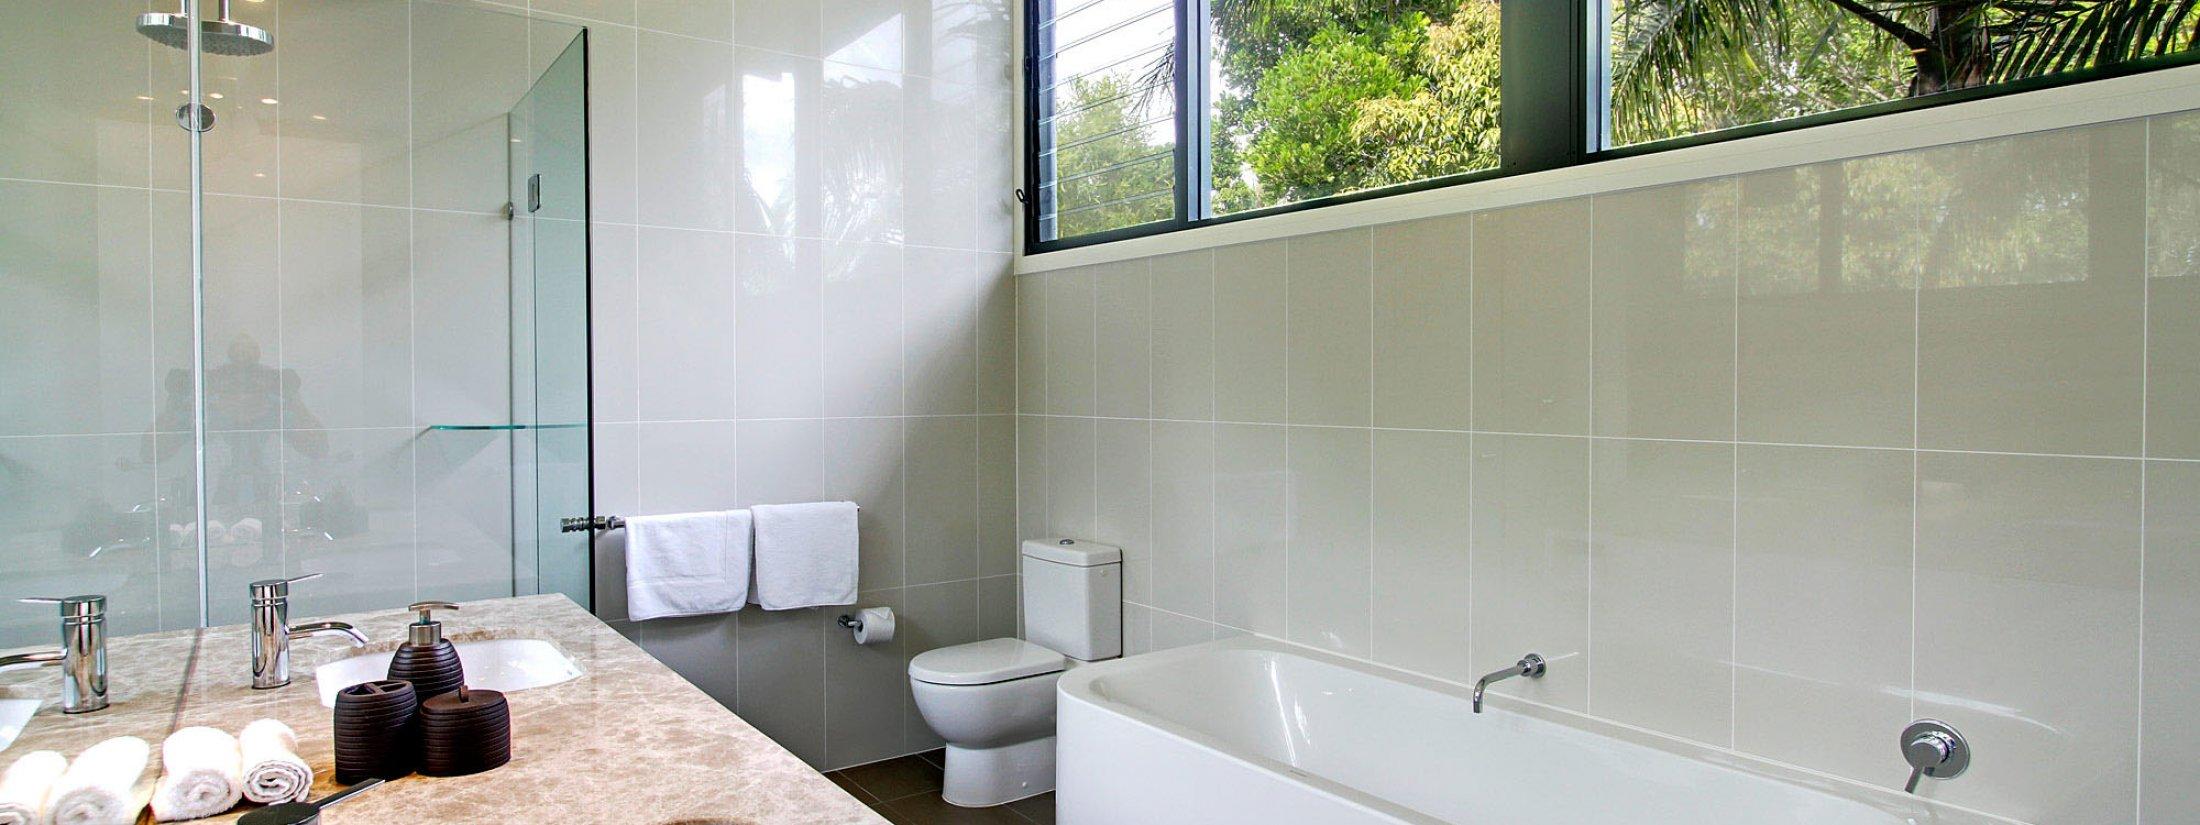 Ocean View at Kiah - Byron Bay - Bathroom Master b